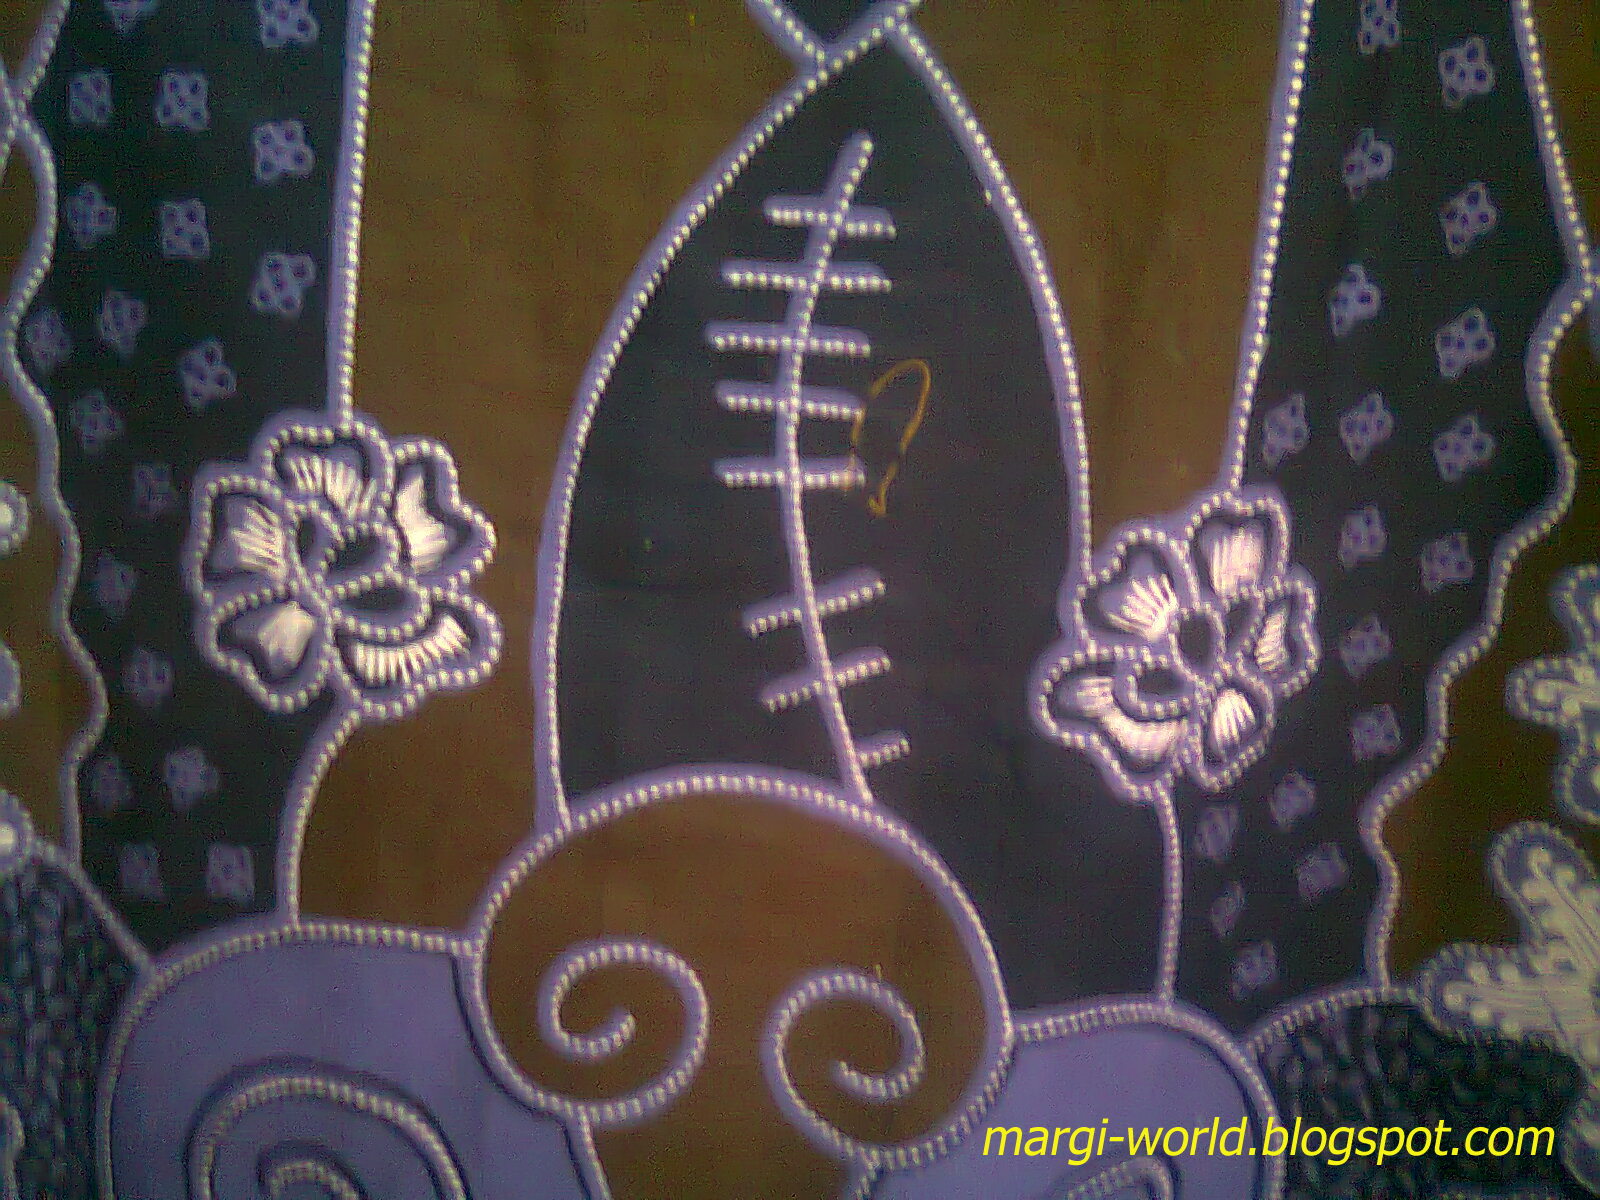 Contoh Nuansa Batik Pekalongan Dengan Desain Sederhana